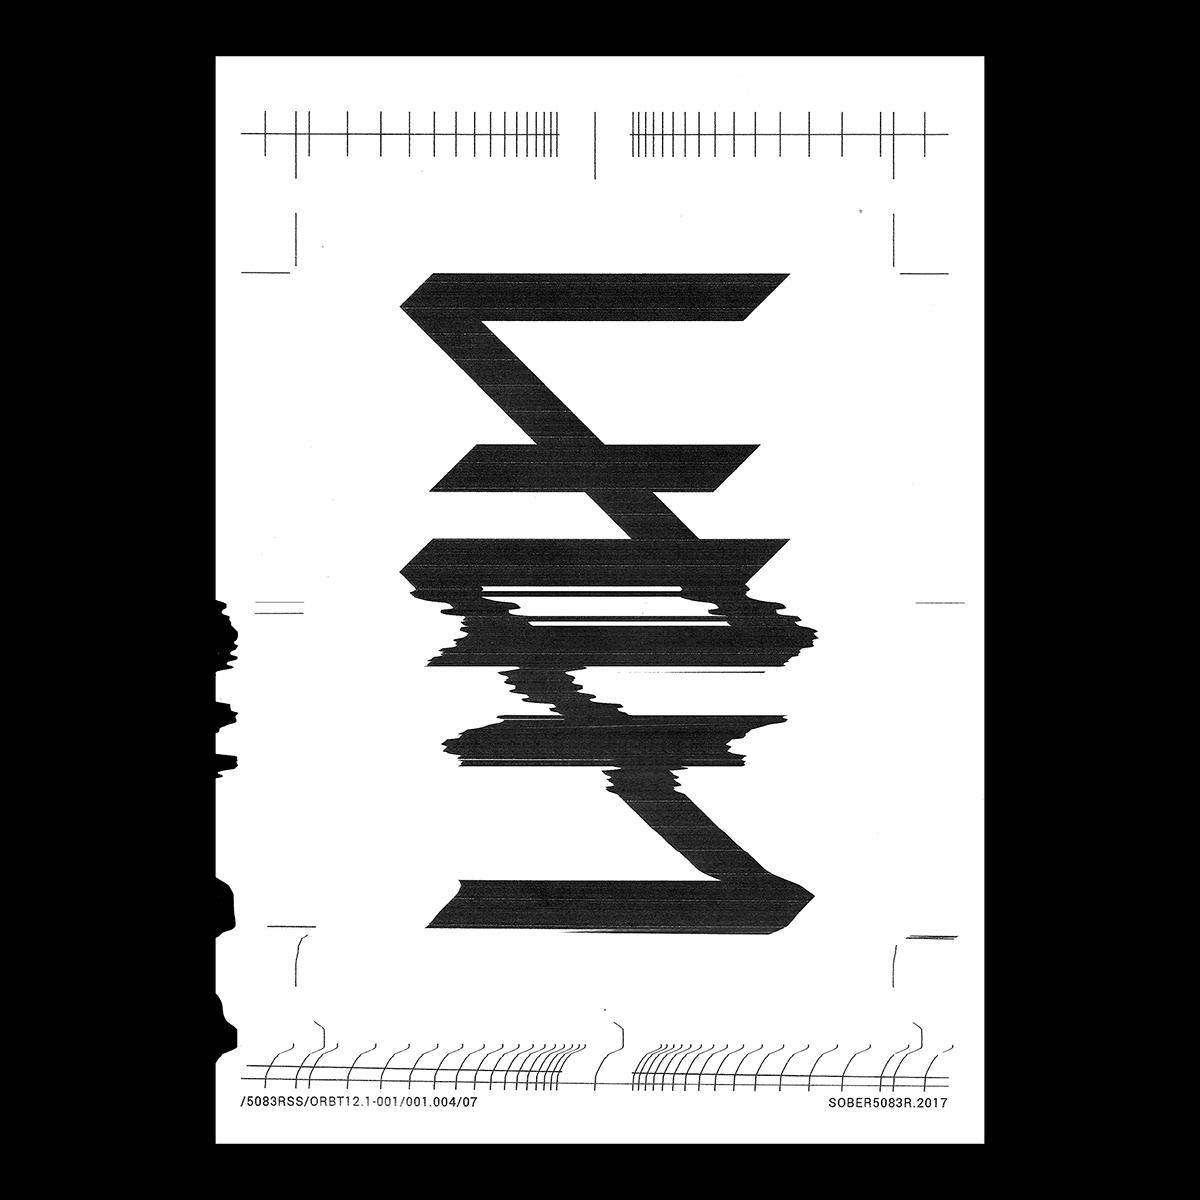 typography   ILLUSTRATION  print design  Zine  symbols poster Poster Design